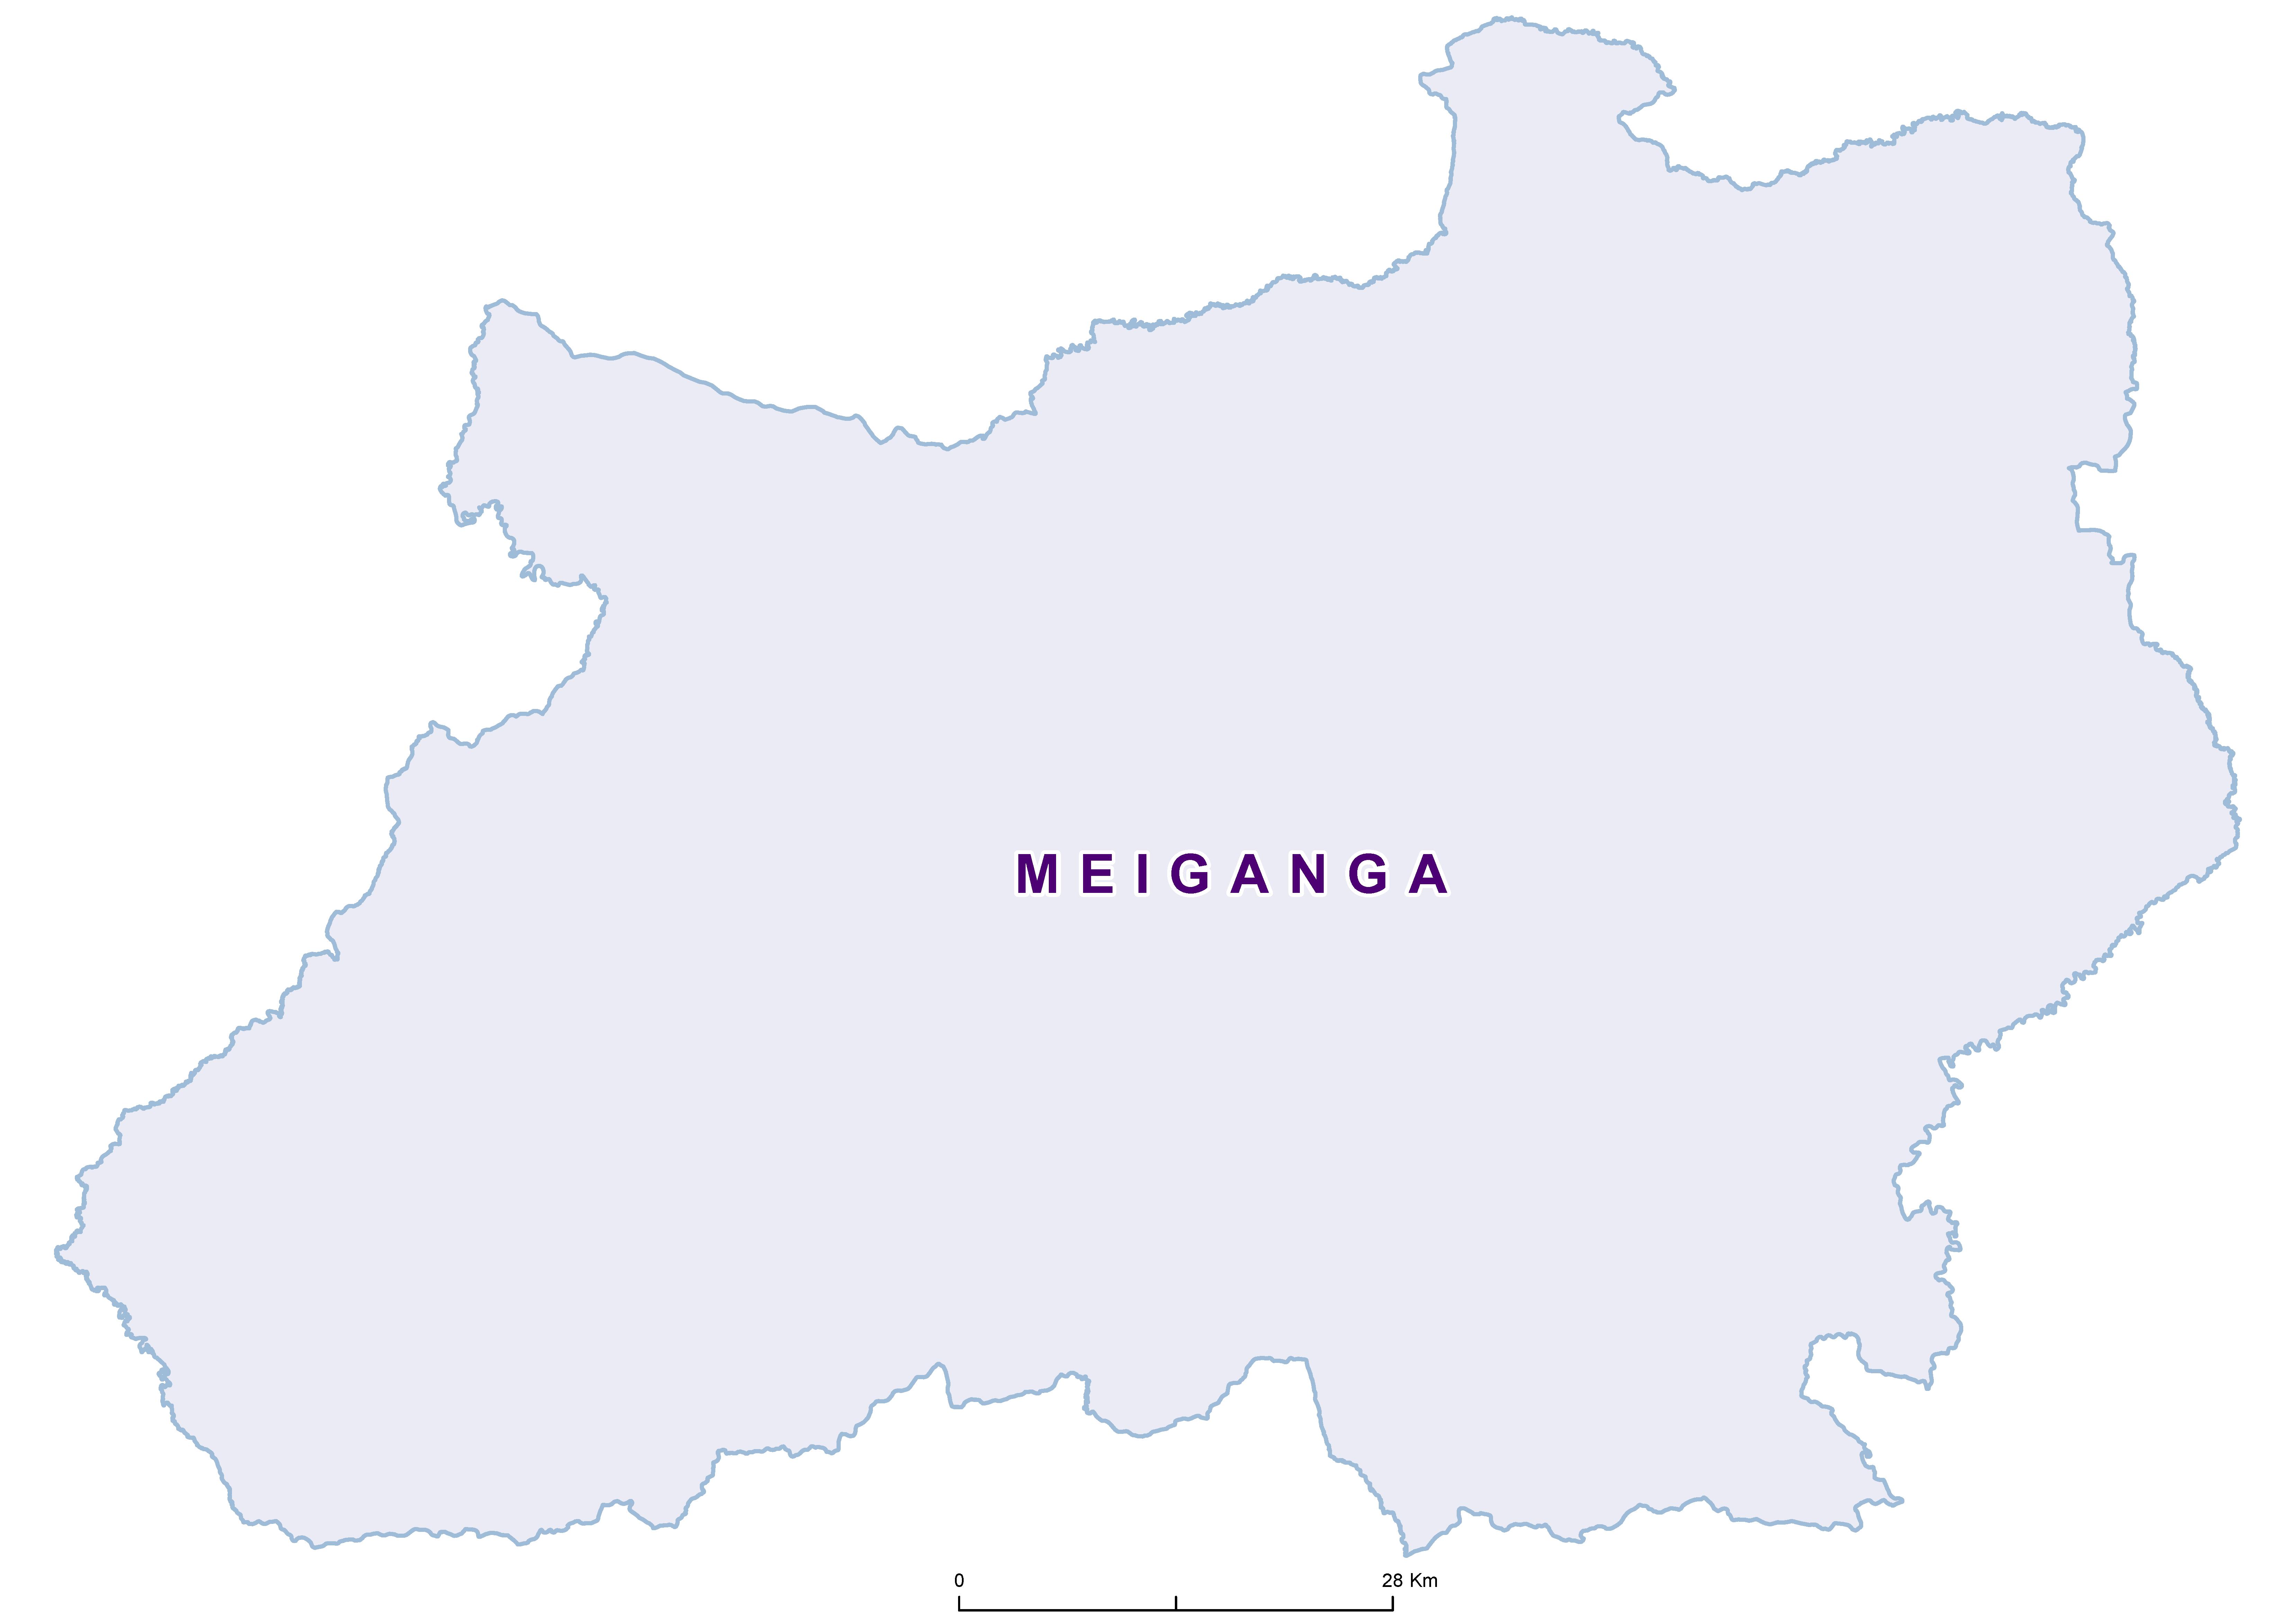 Meiganga Mean SCH 20180001